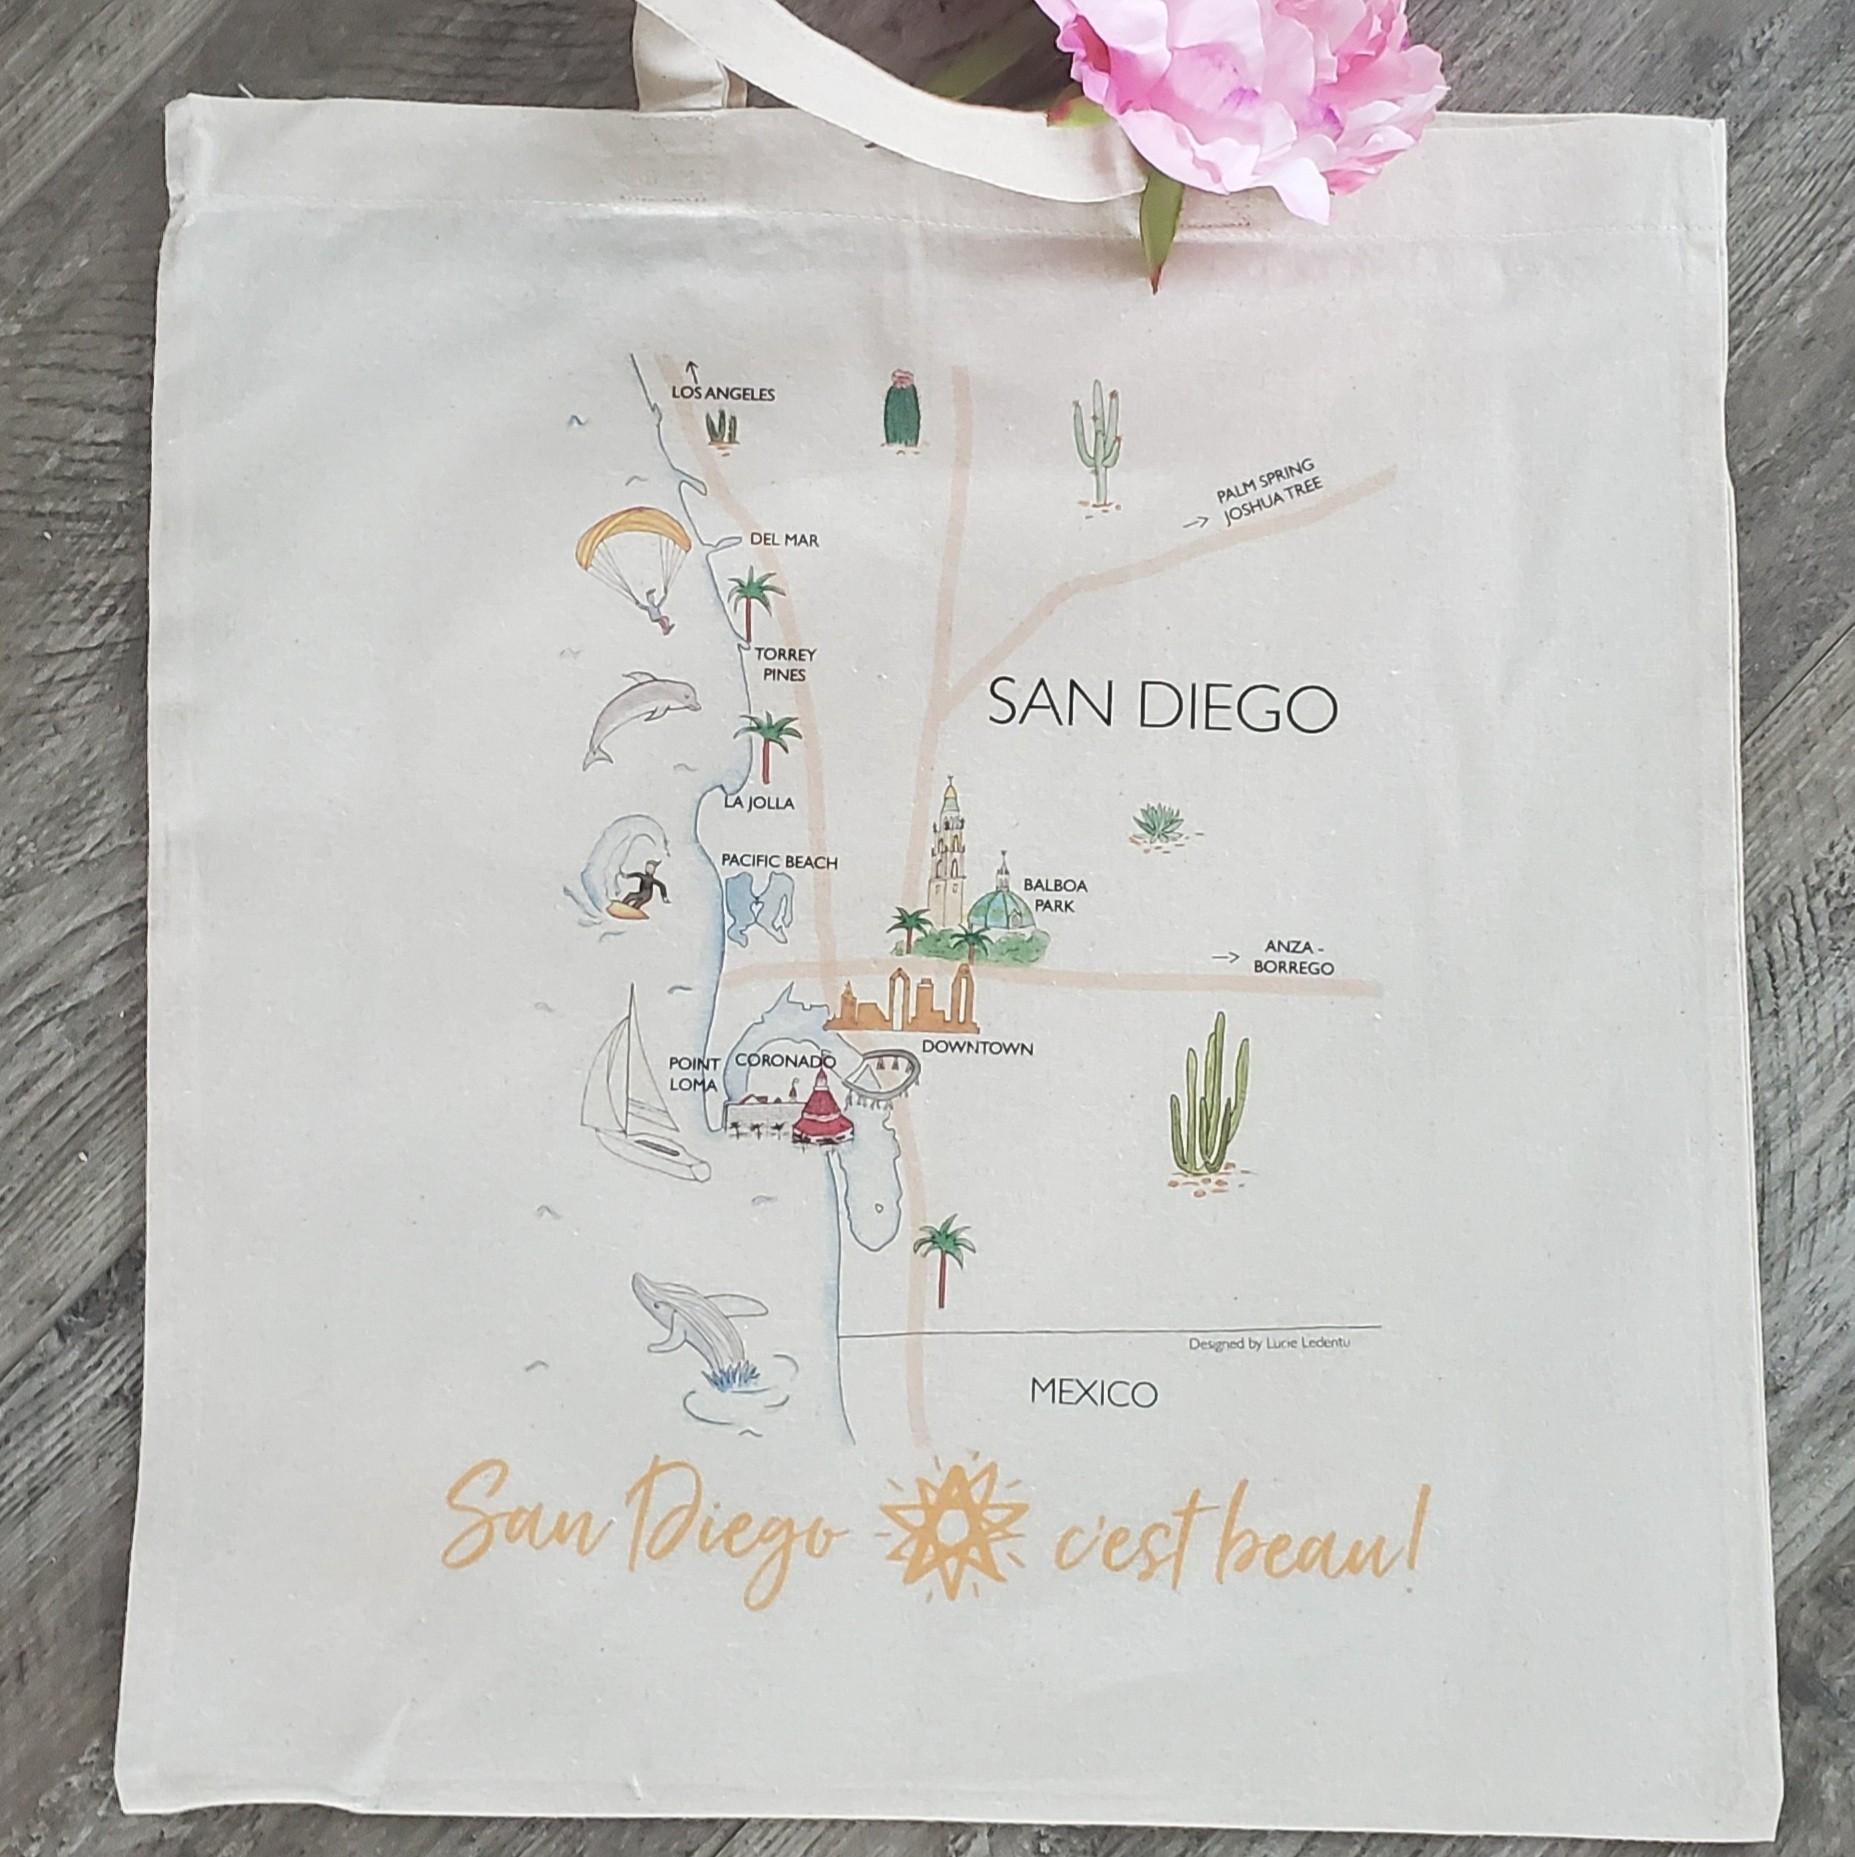 Organic Cotton Tote Bag San Diego C'est Beau